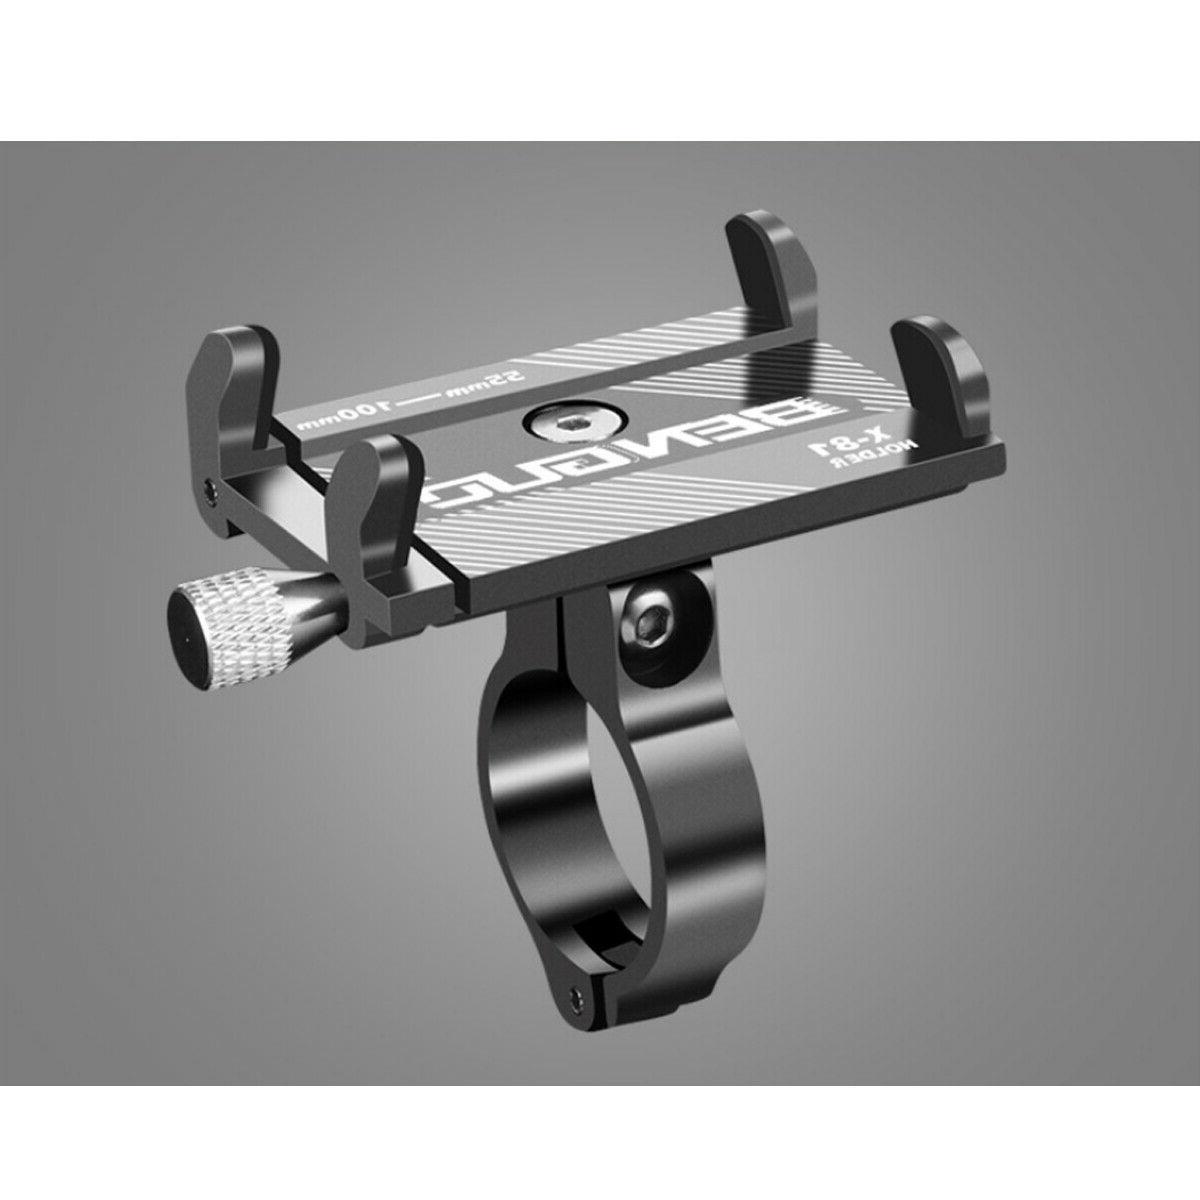 Aluminum Bicycle Holder Alloy Motorcycle Bike Handlebar Cell GPS